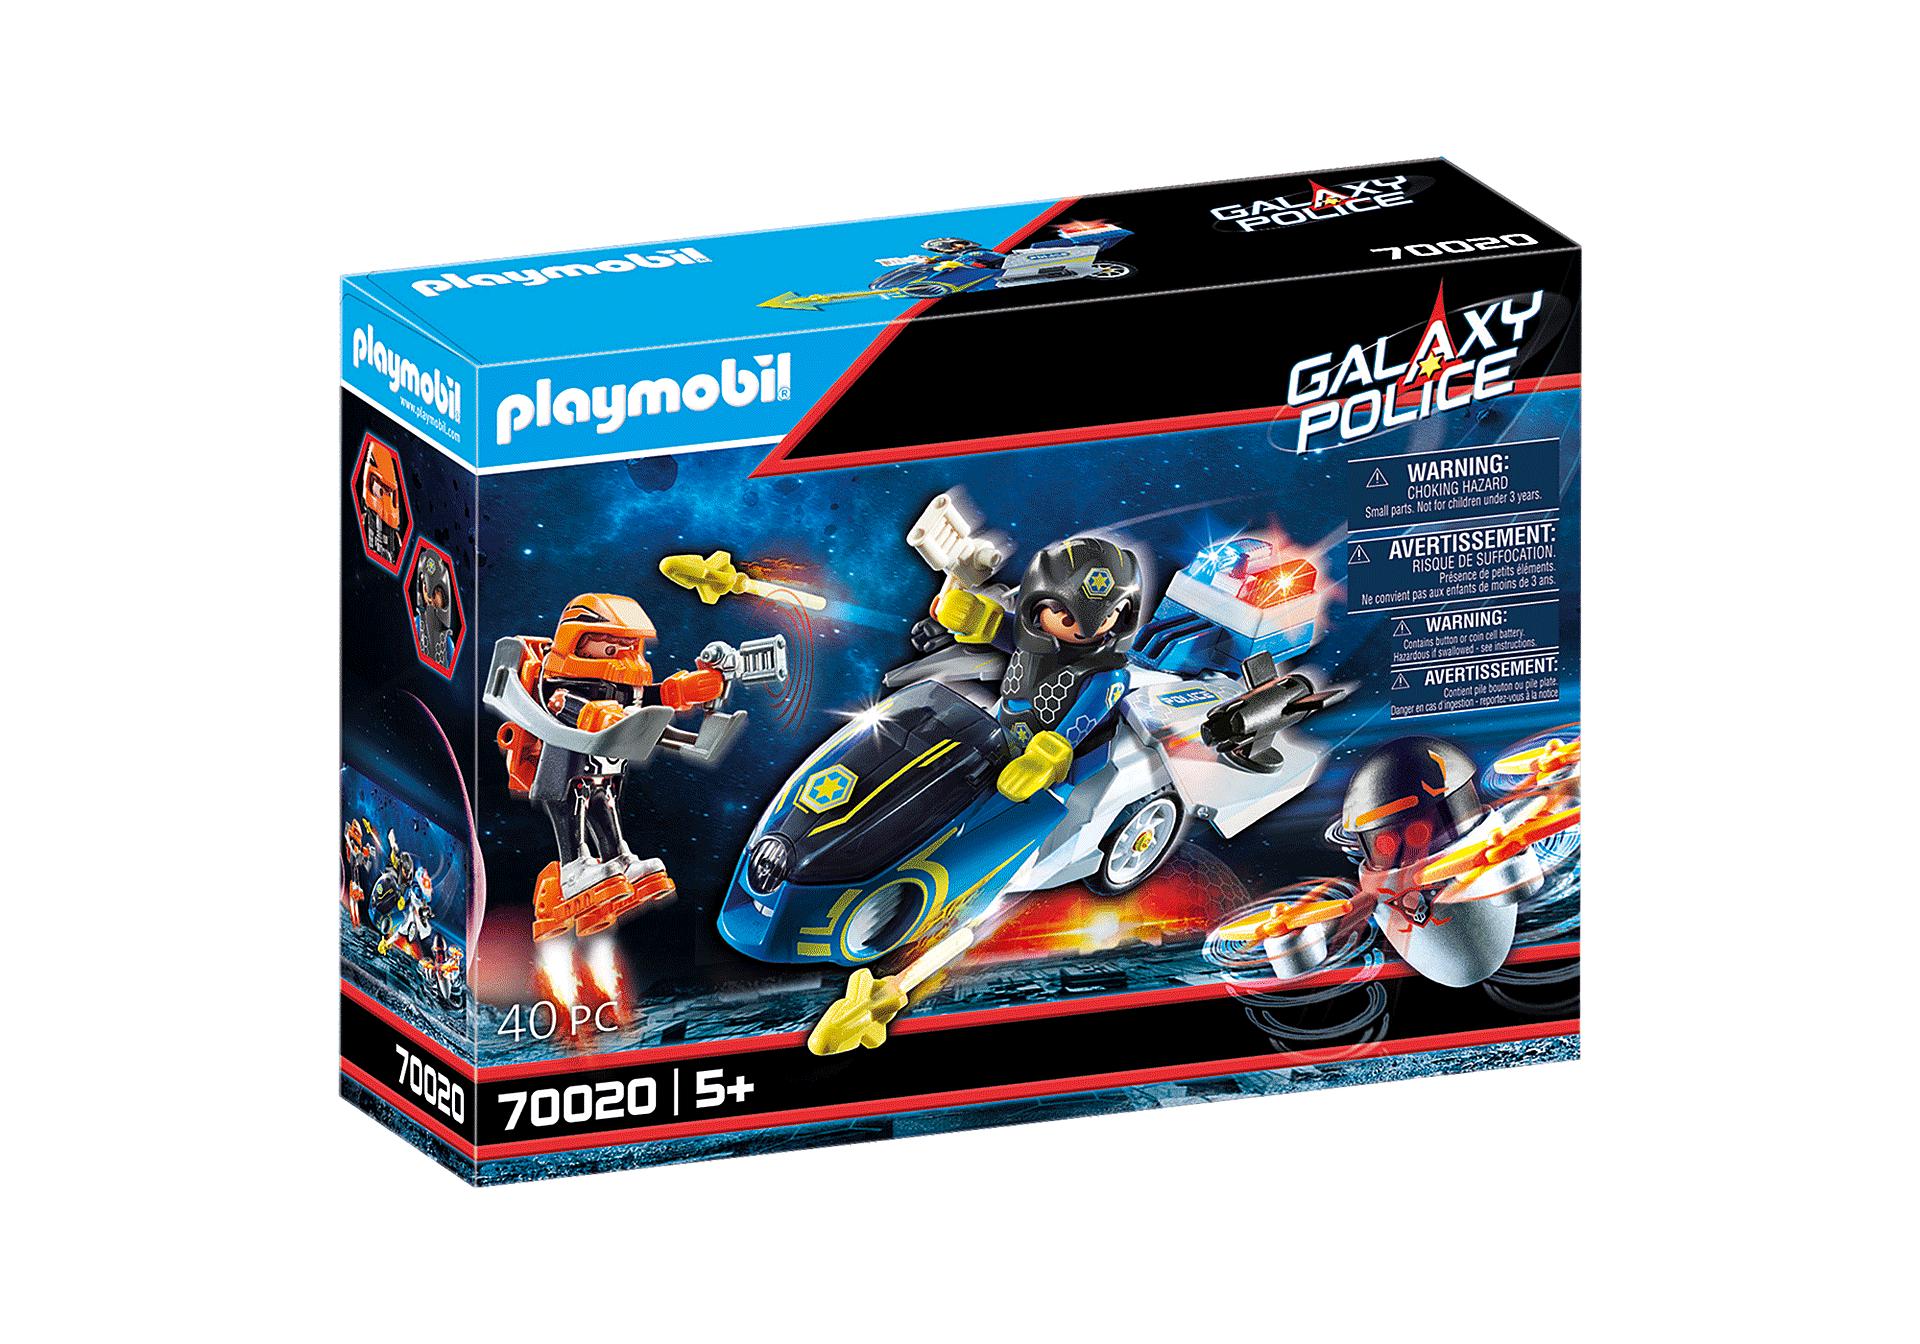 Playmobil - Galaxy Police Bike (70020)